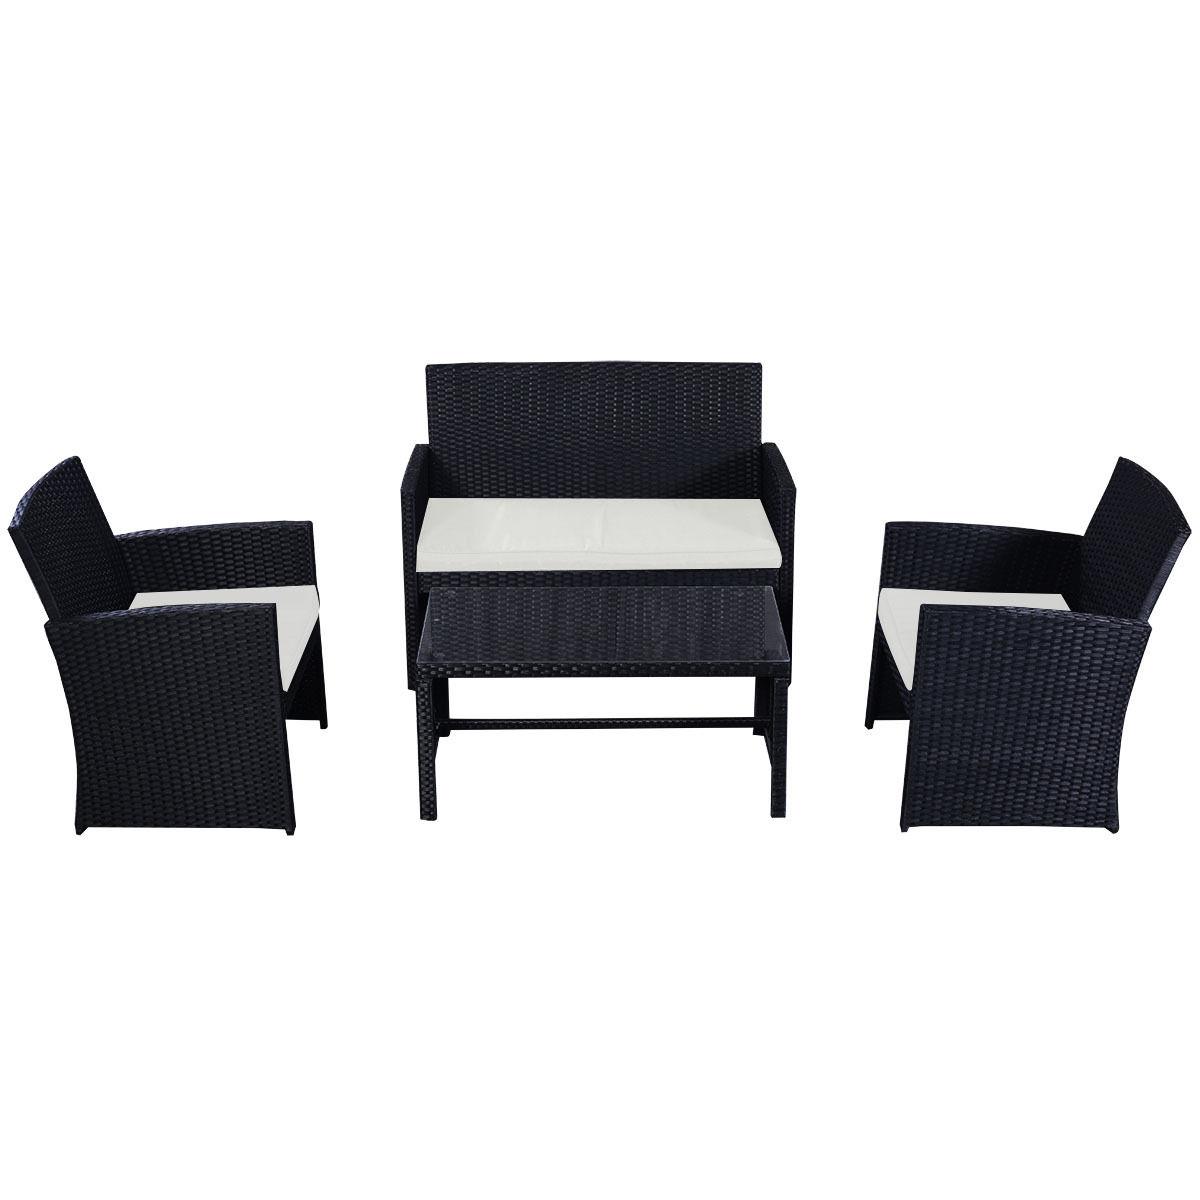 Costway 4 Pc Rattan Patio Furniture Set Garden Lawn Sofa Wicker Cushioned Seat Black 4